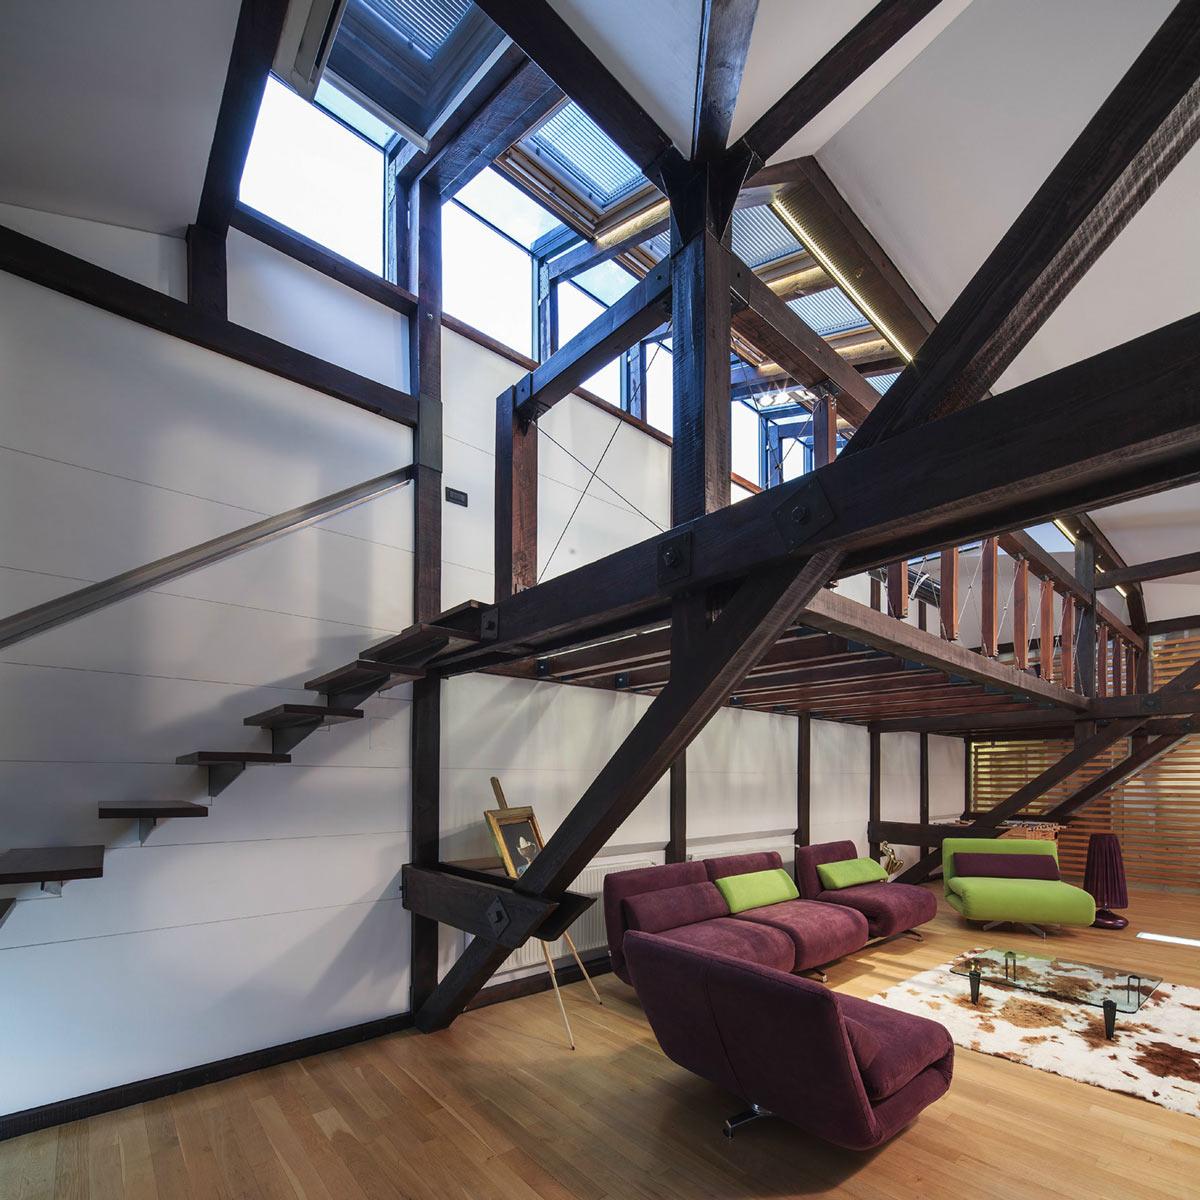 Stairs, Loft in Bucharest, Romania by TECON